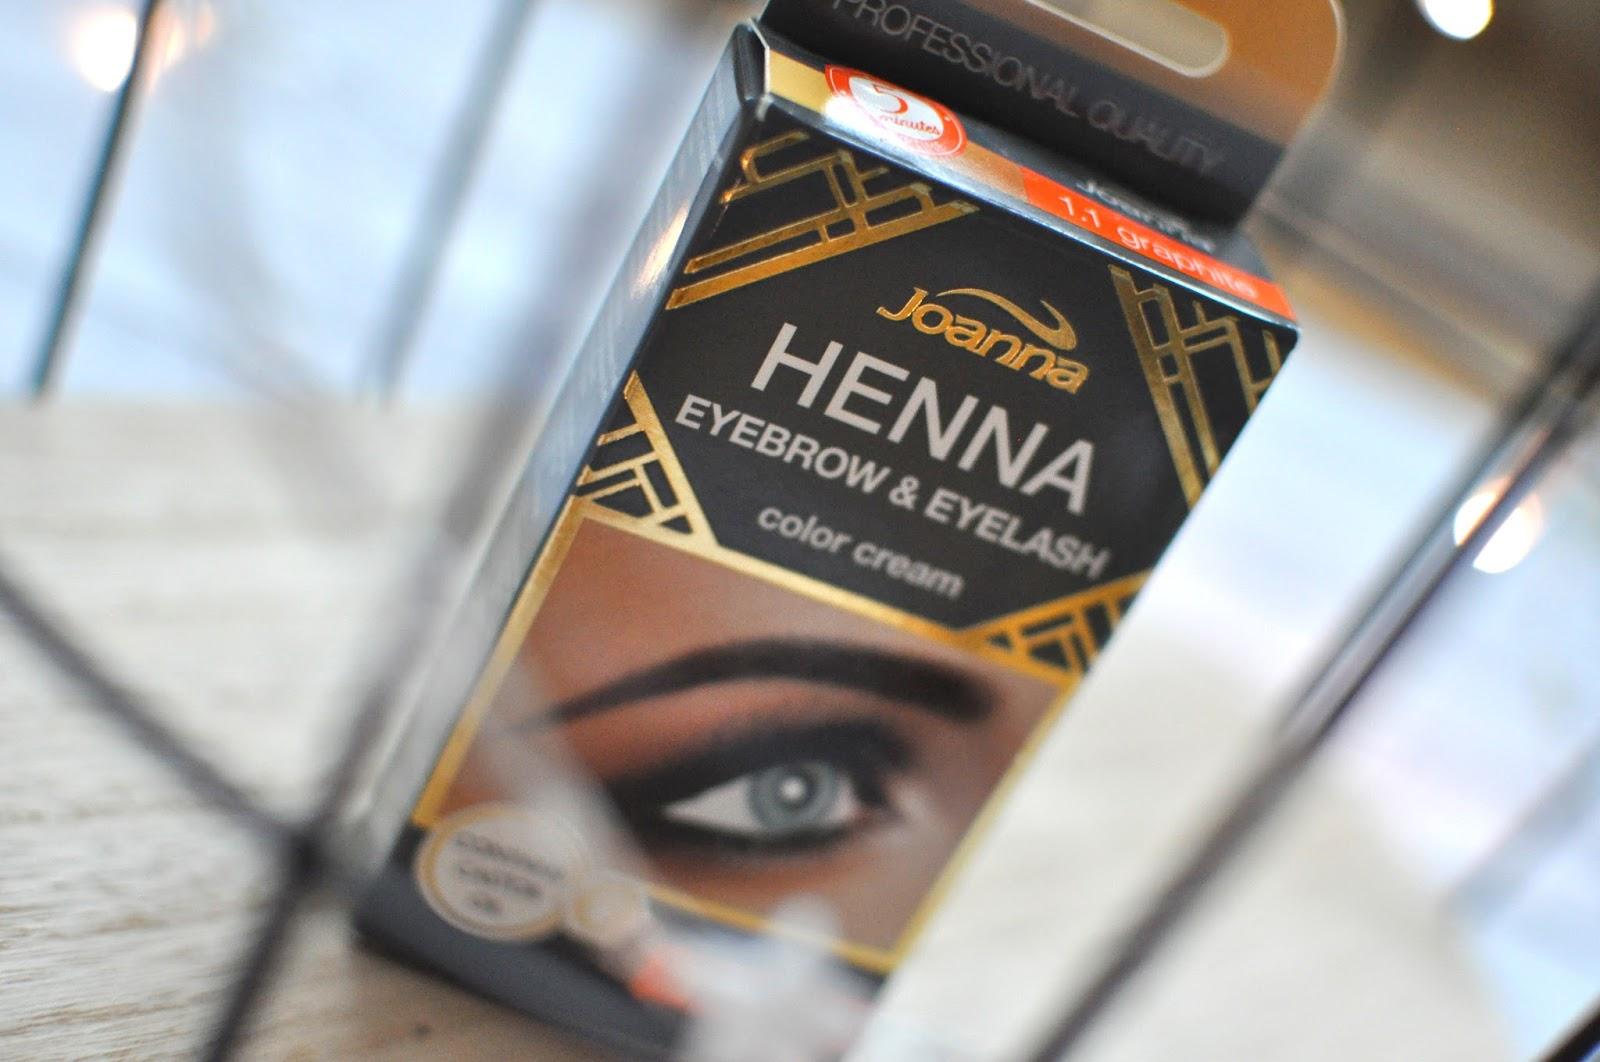 henna_w_kremie_joanna